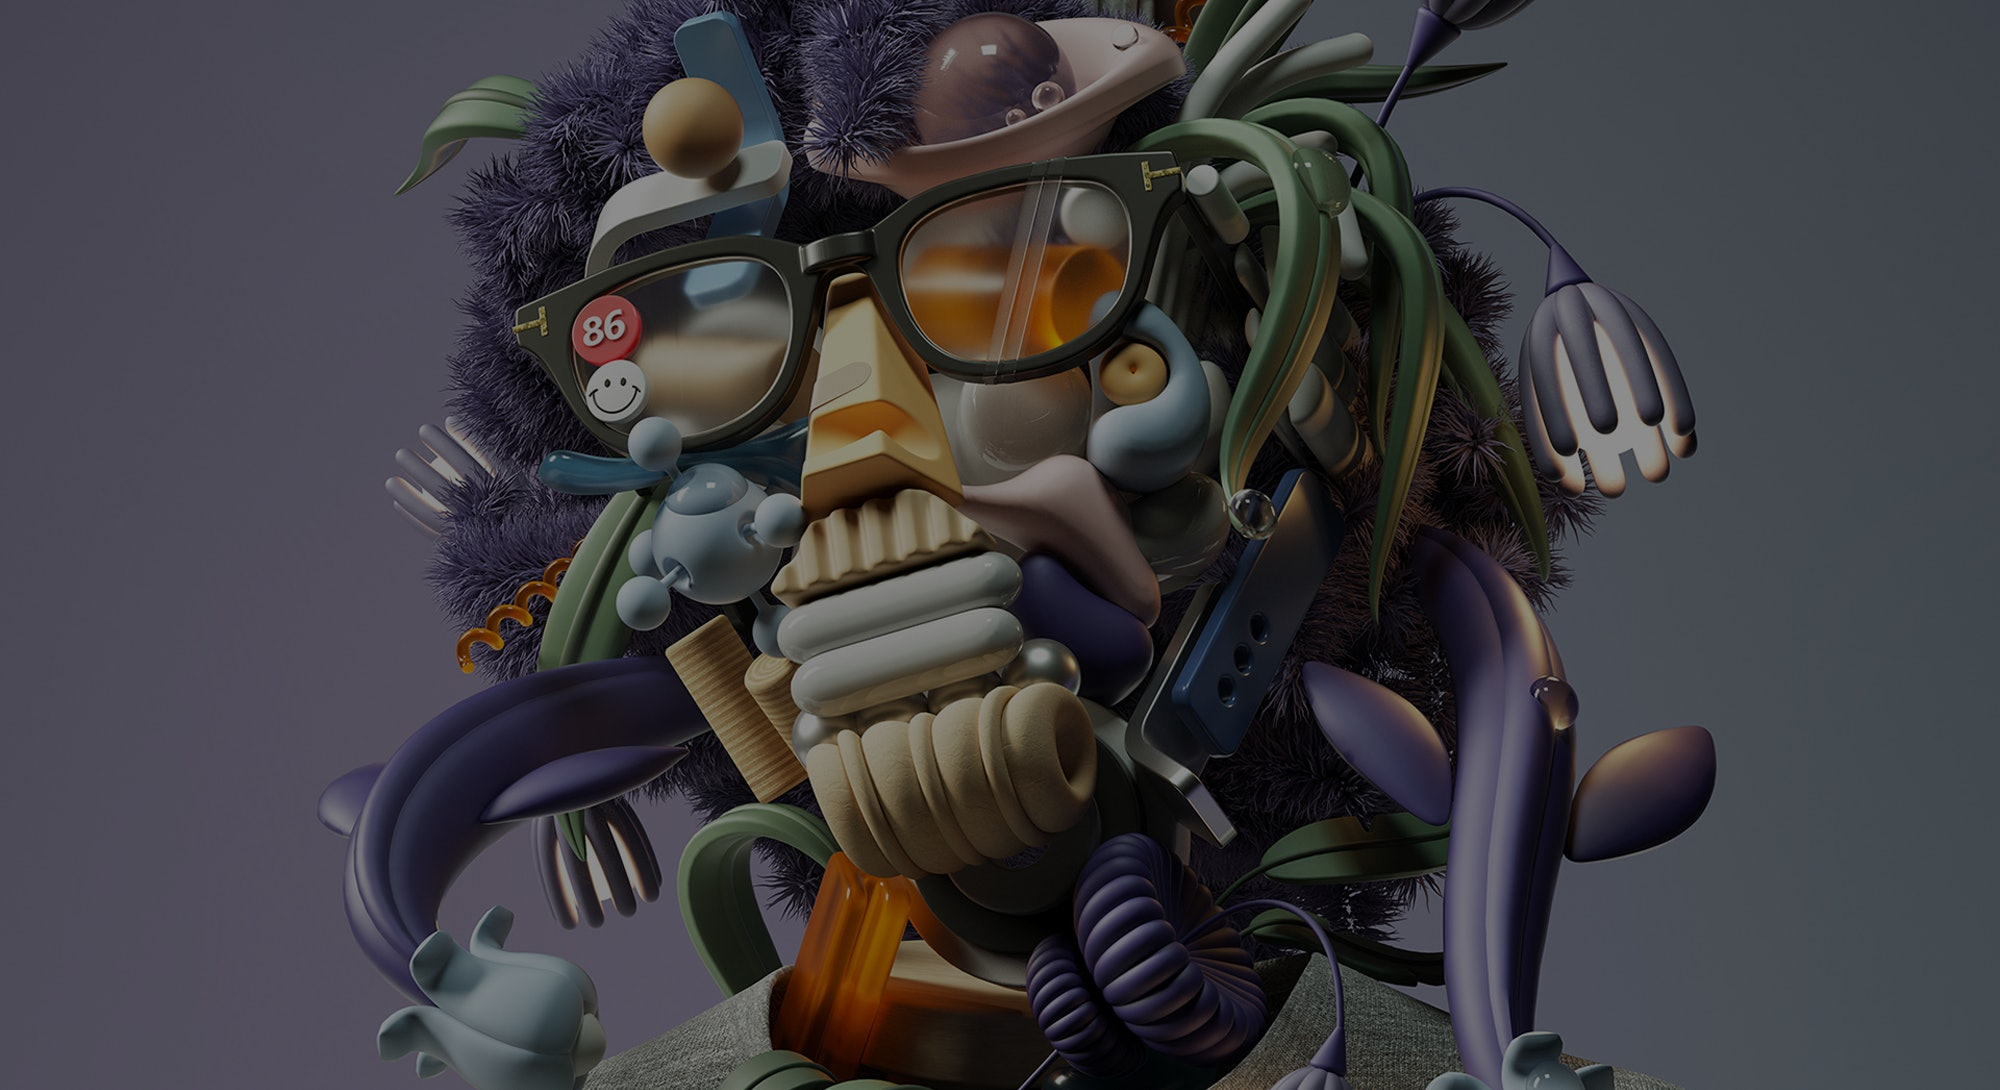 Art from graphic designer and digital artist, Omar Aqil. Digital art. CGI. Animation. Fine art. Grap...